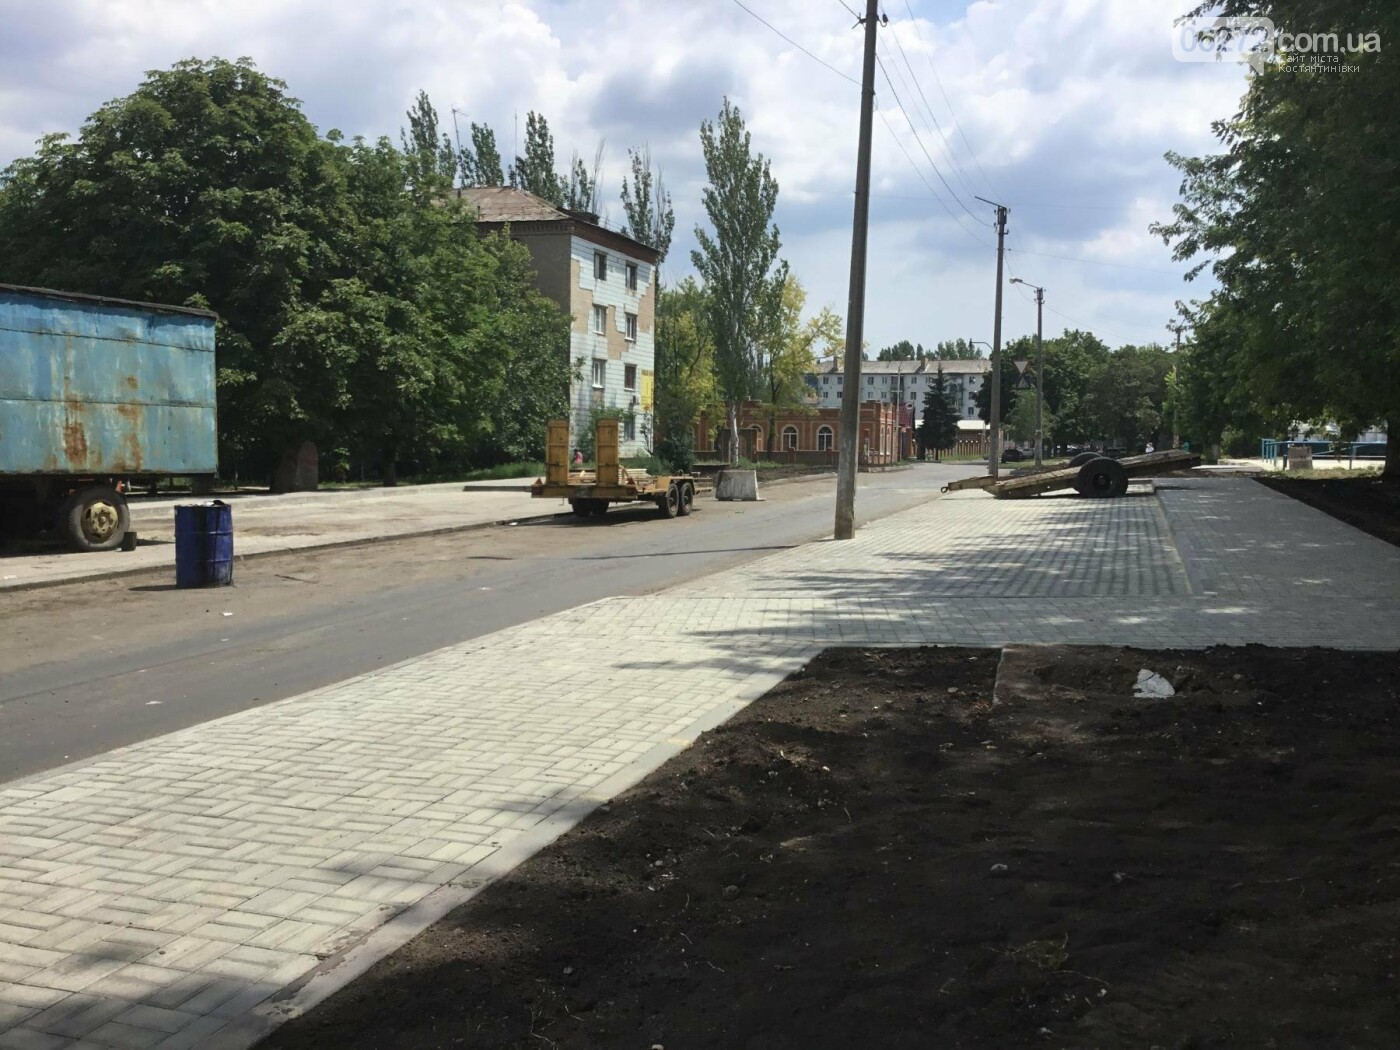 В Константиновке продолжают ремонт дорог, фото-3